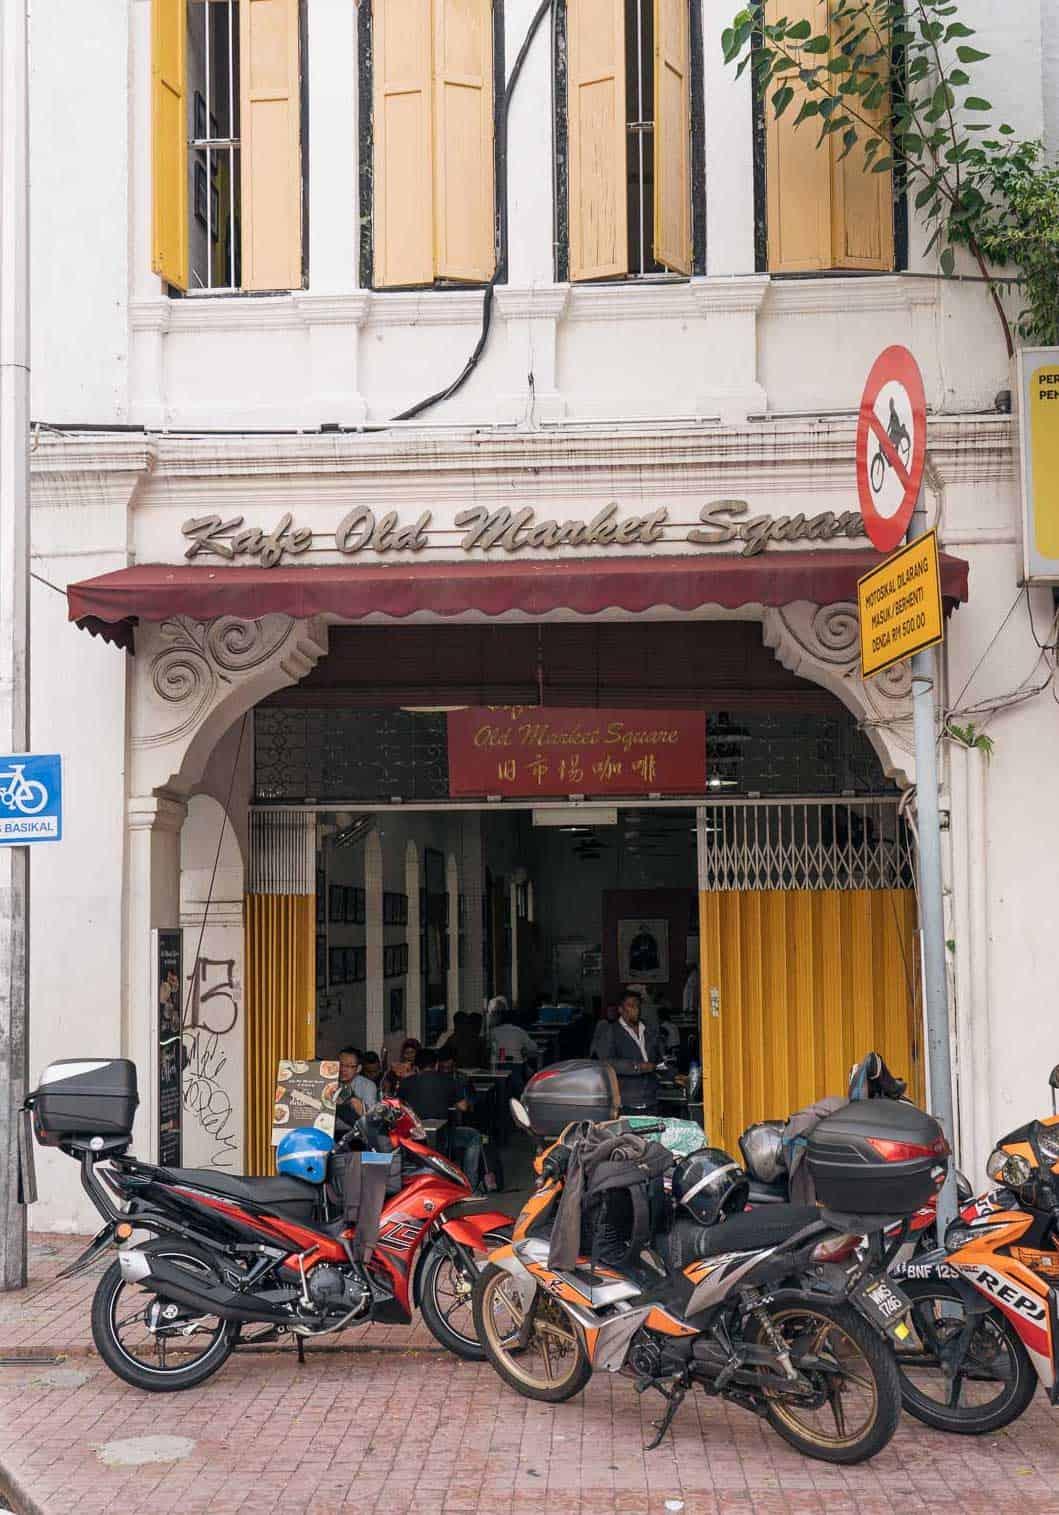 Old-Market-Square-Cafe-Chinatown-Kuala-Lumpur-Malaysia ] Travel Mermaid